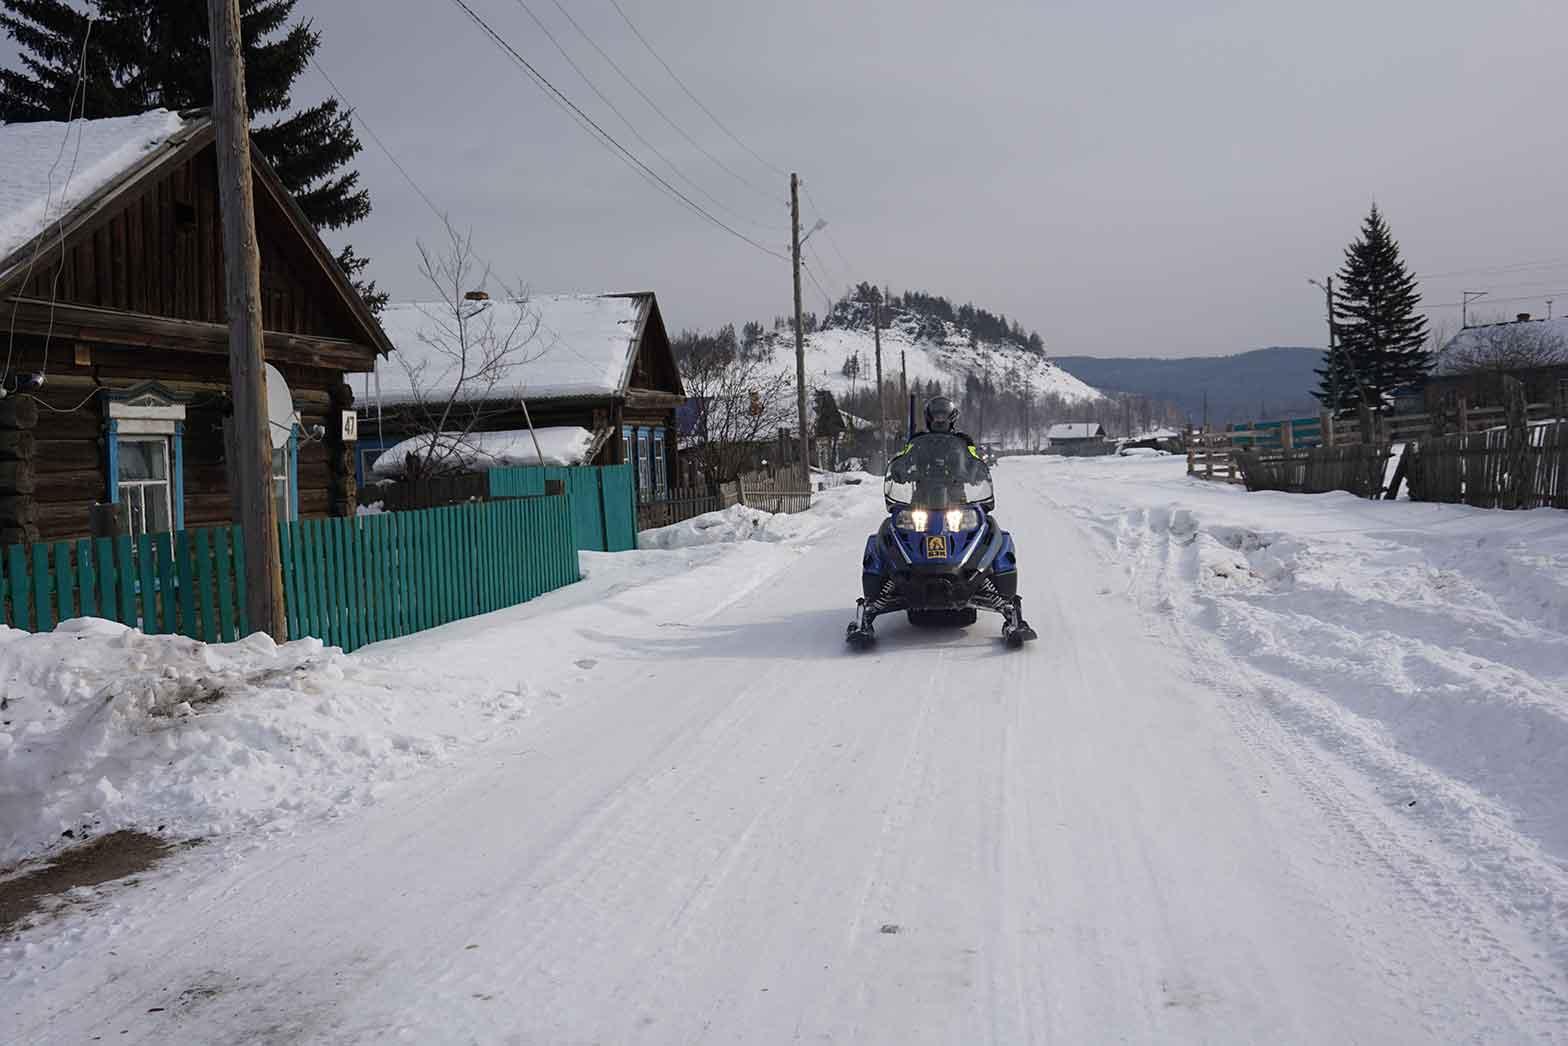 Riding through the village